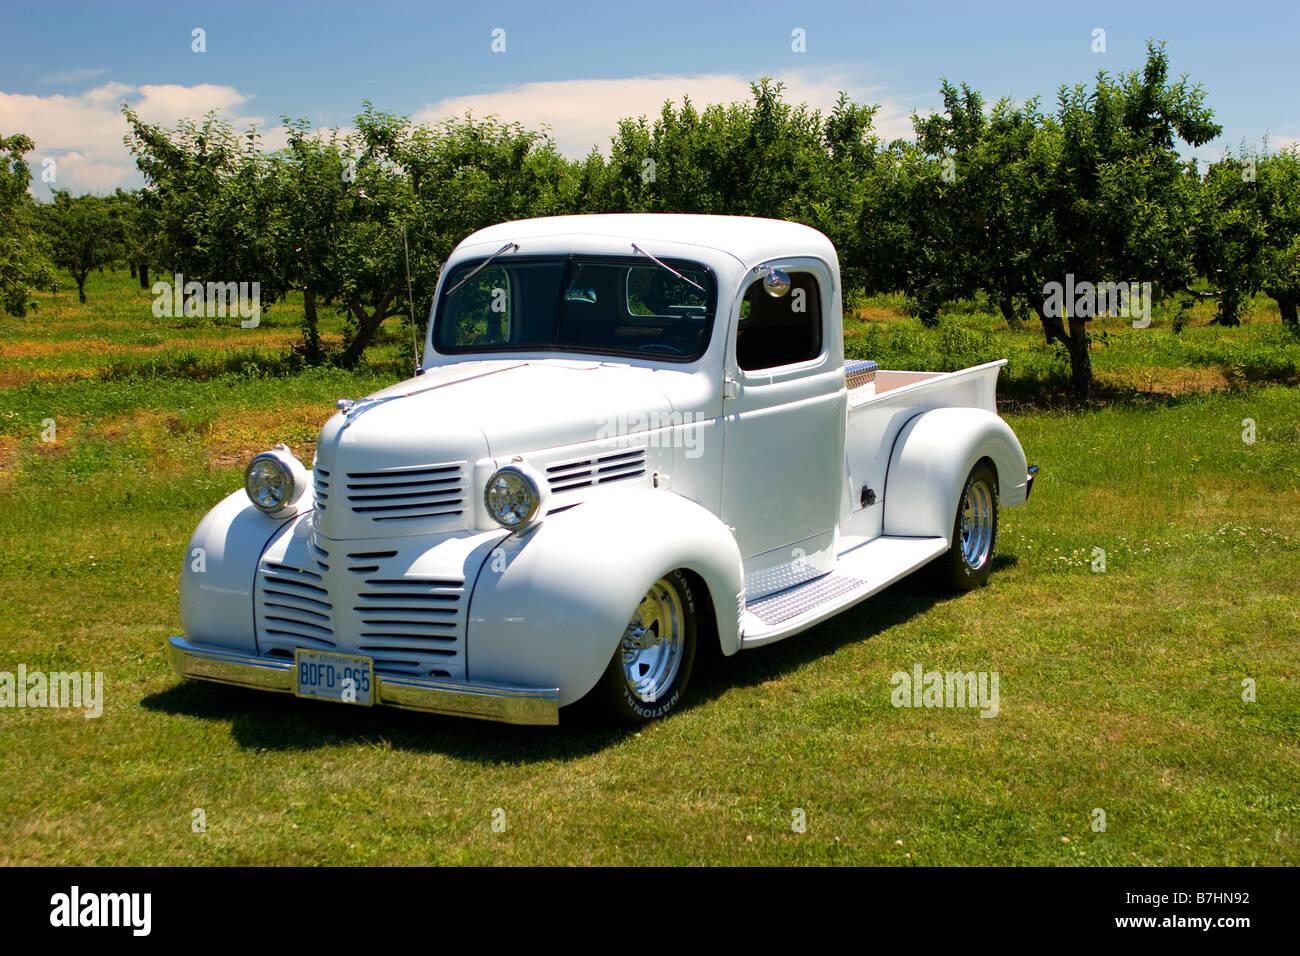 1940 Custom Dodge Pick Up Truck Stock Photo Alamy